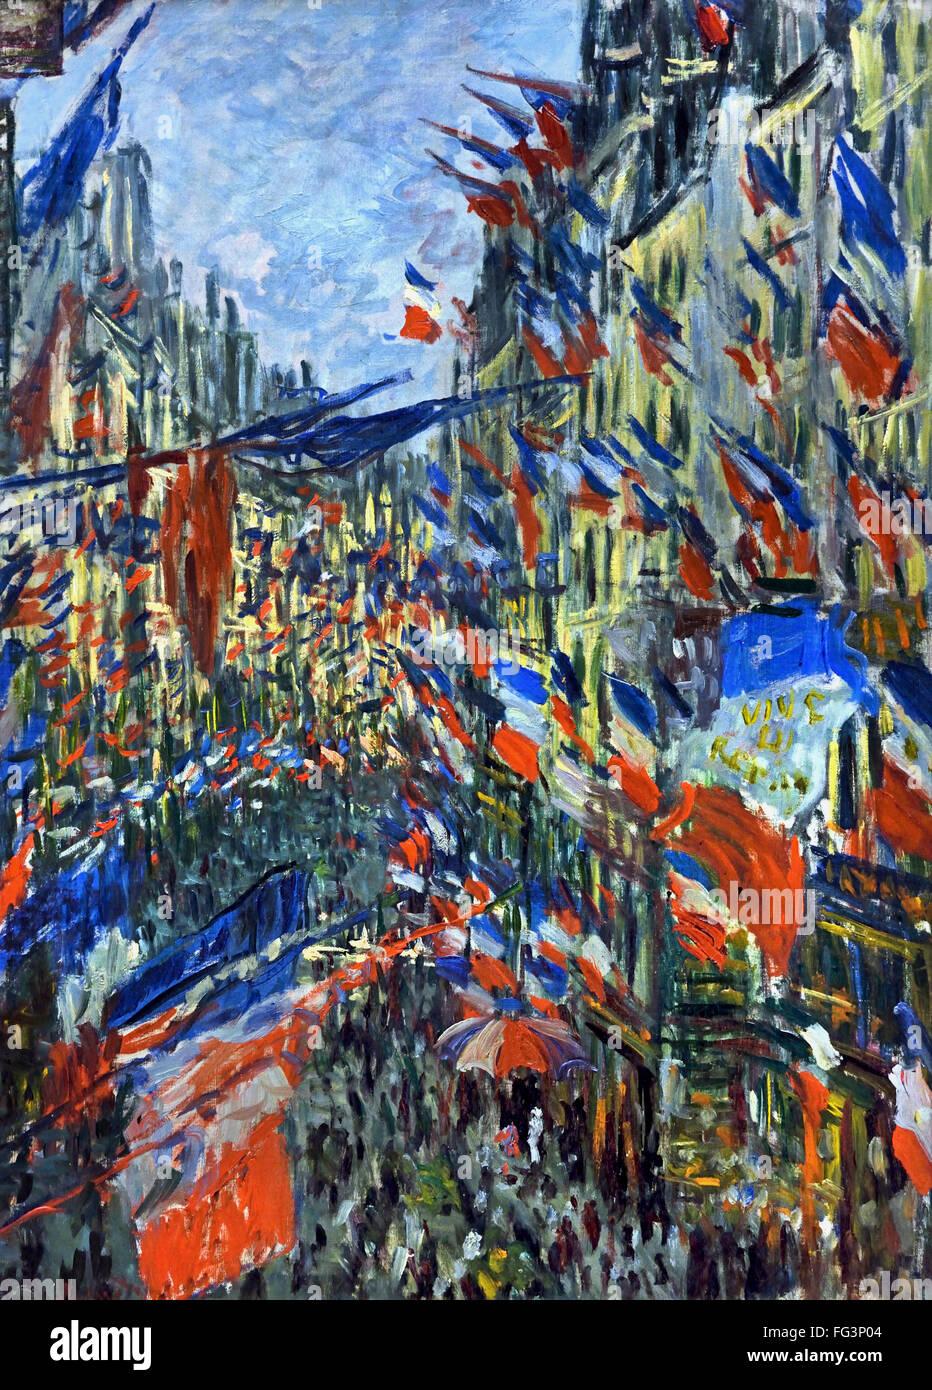 RUE SAINT DENIS, FÊTE DU 30 JUIN - CELEBRATION OF 30 JUNE 1878 CLAUDE MONET (1840 - 1926) France French - Stock Image